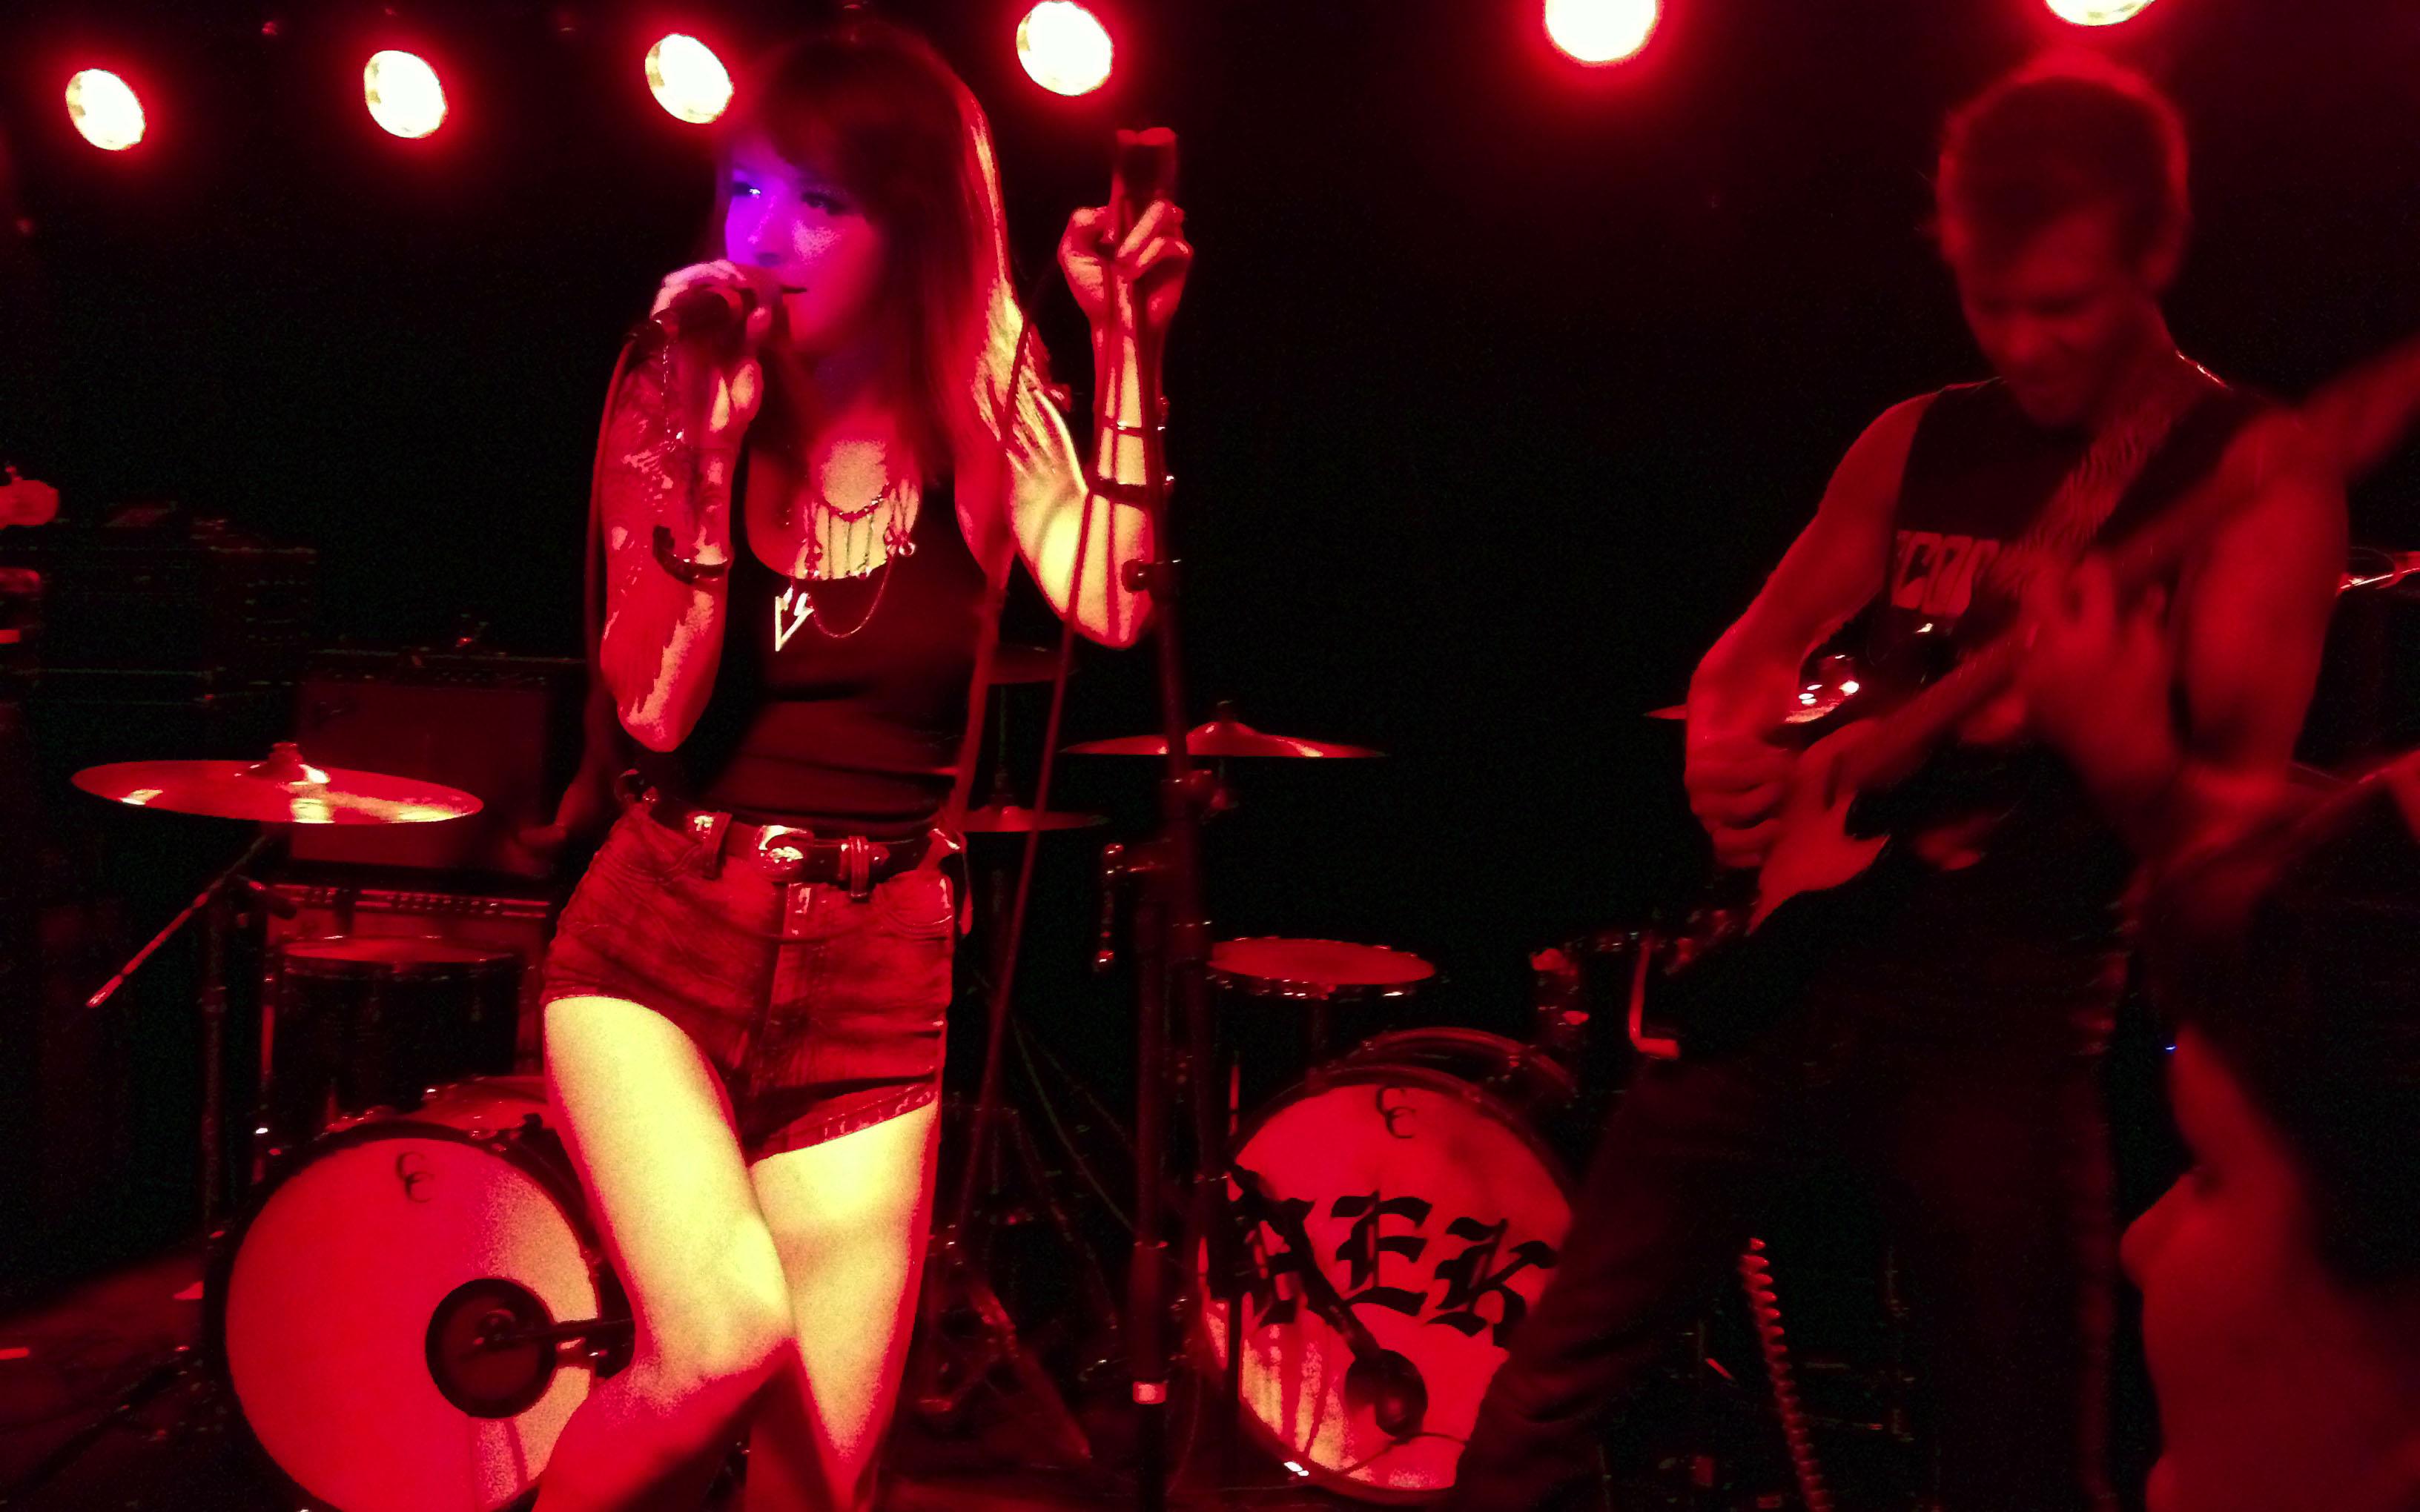 Concert Review: Hanni El Khatib at The Riot Room in Kansas City ...